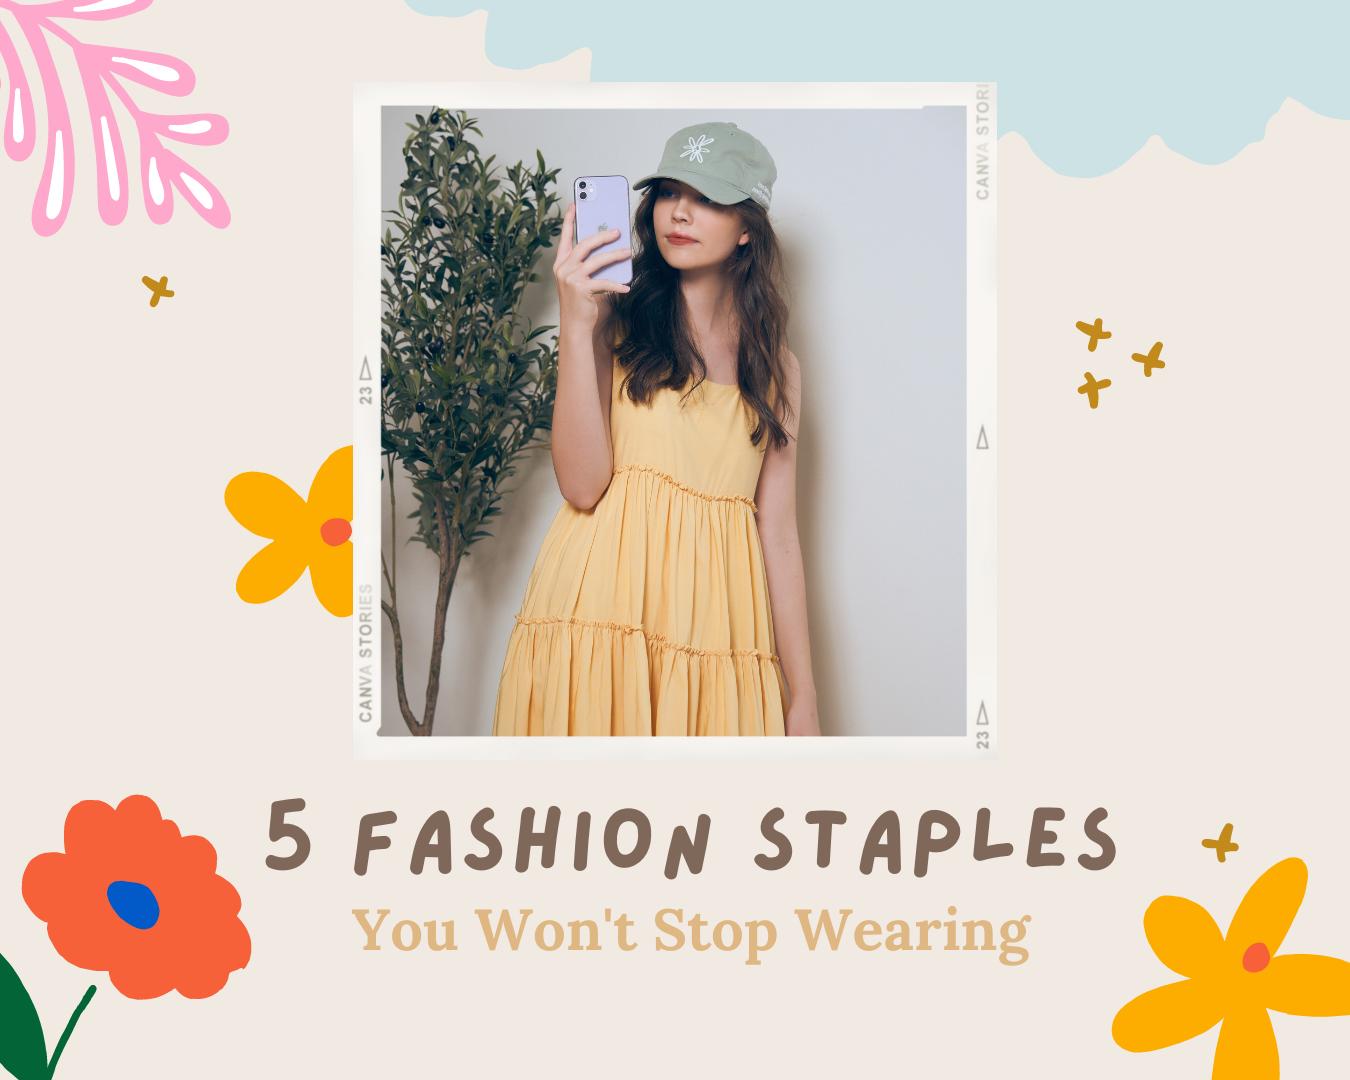 5 Fashion Staples You Won't Stop Wearing